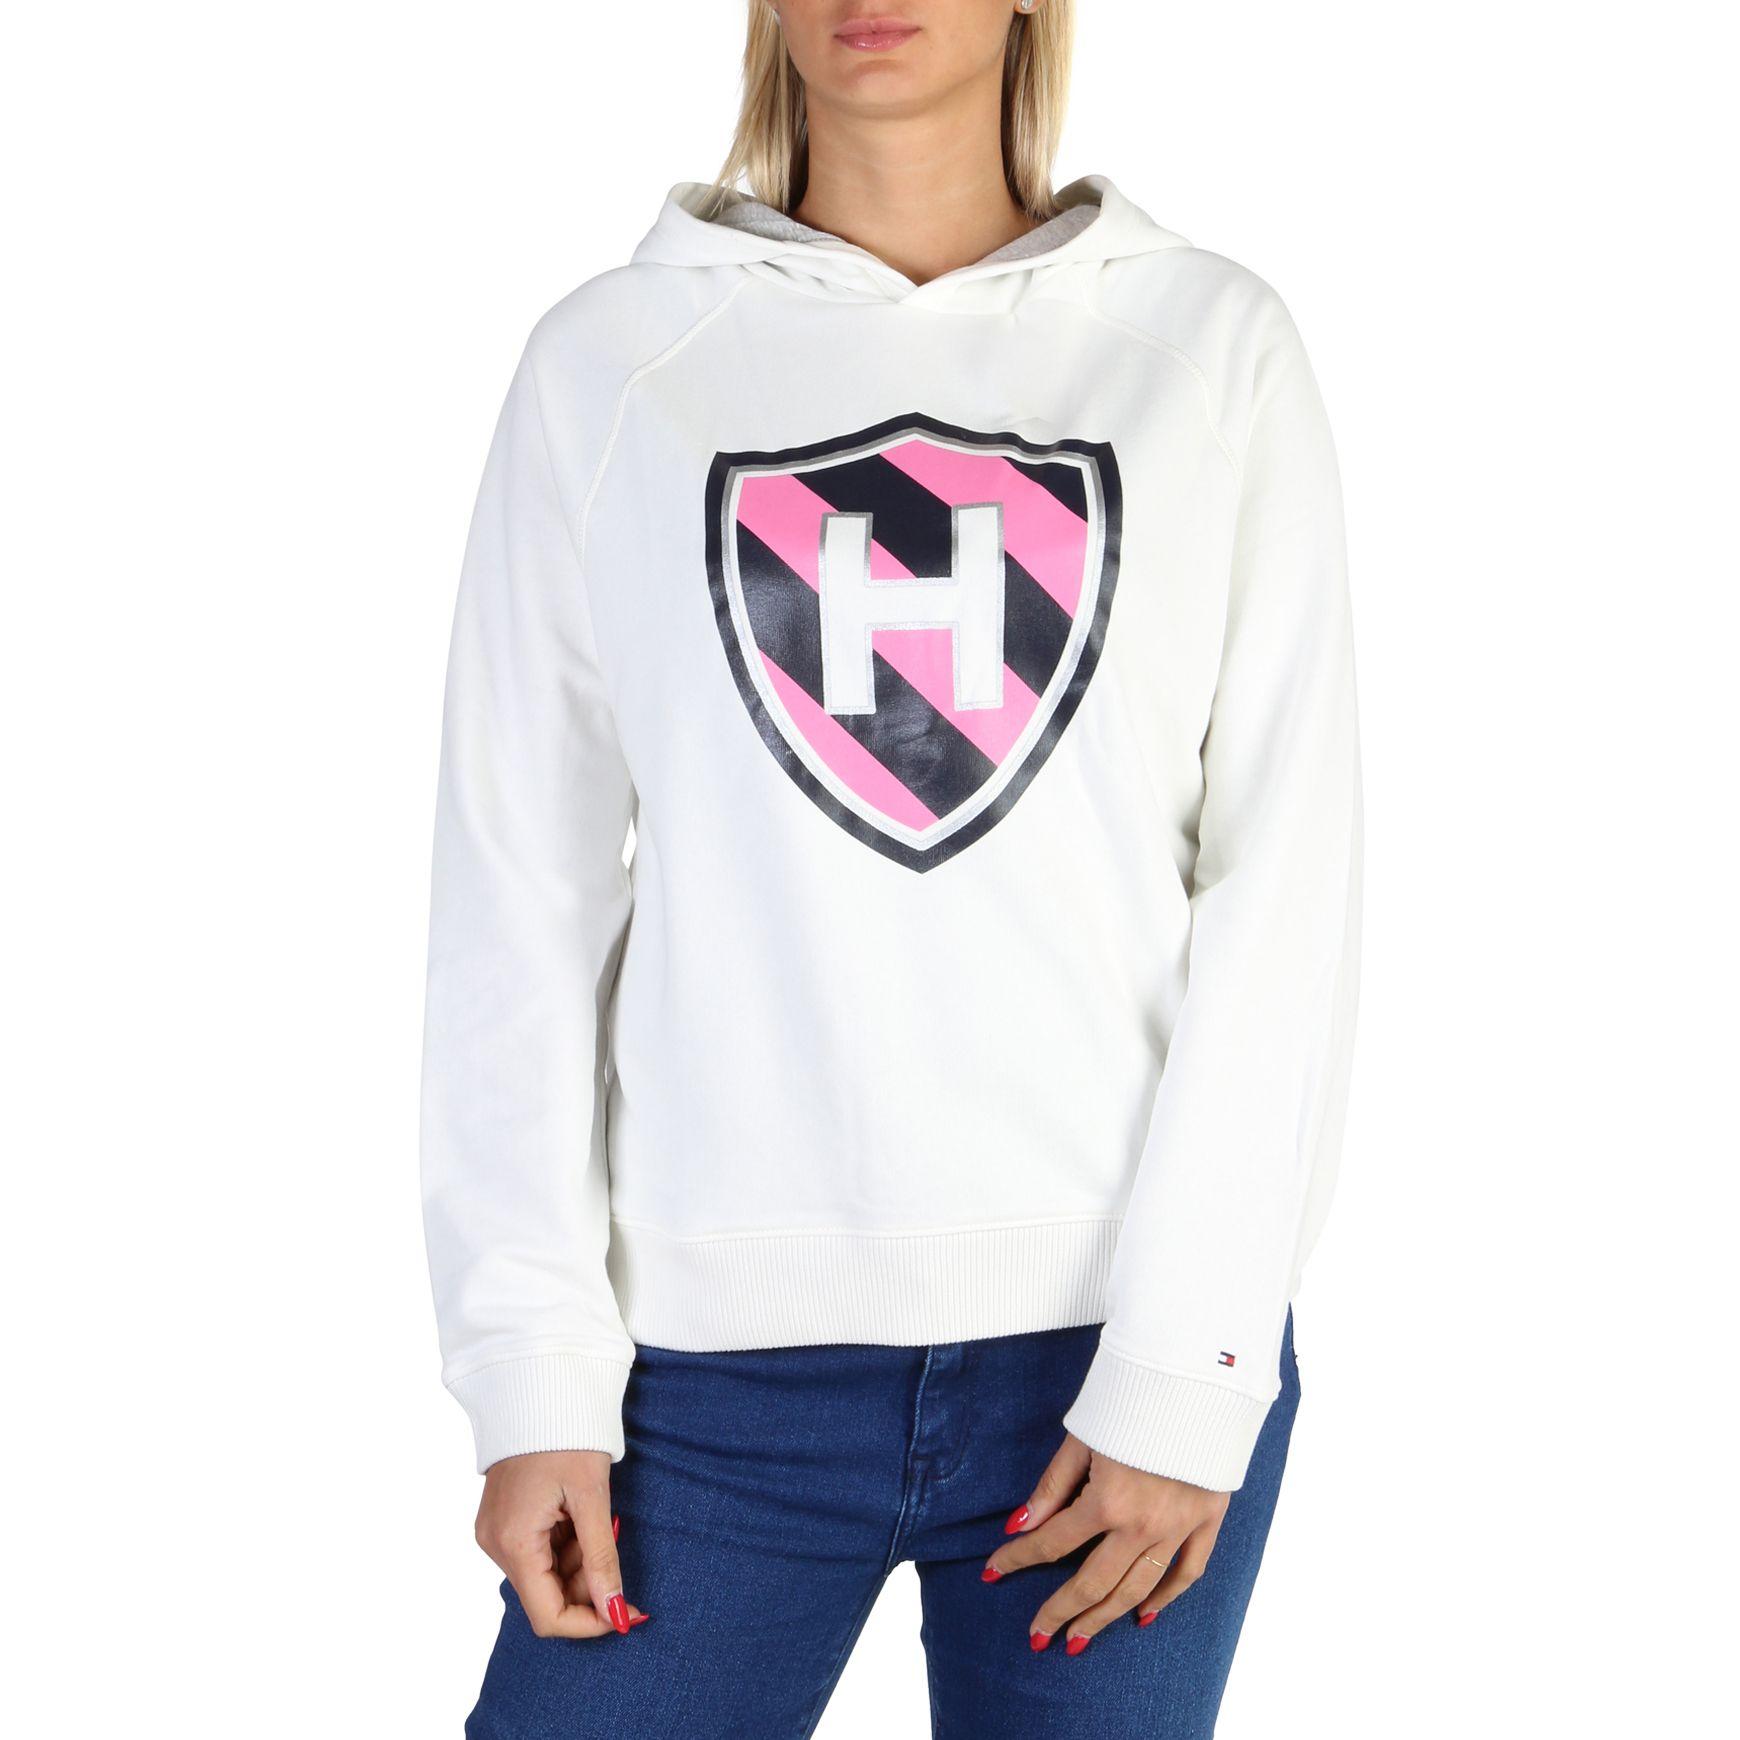 Tommy Hilfiger Womens Sweatshirts